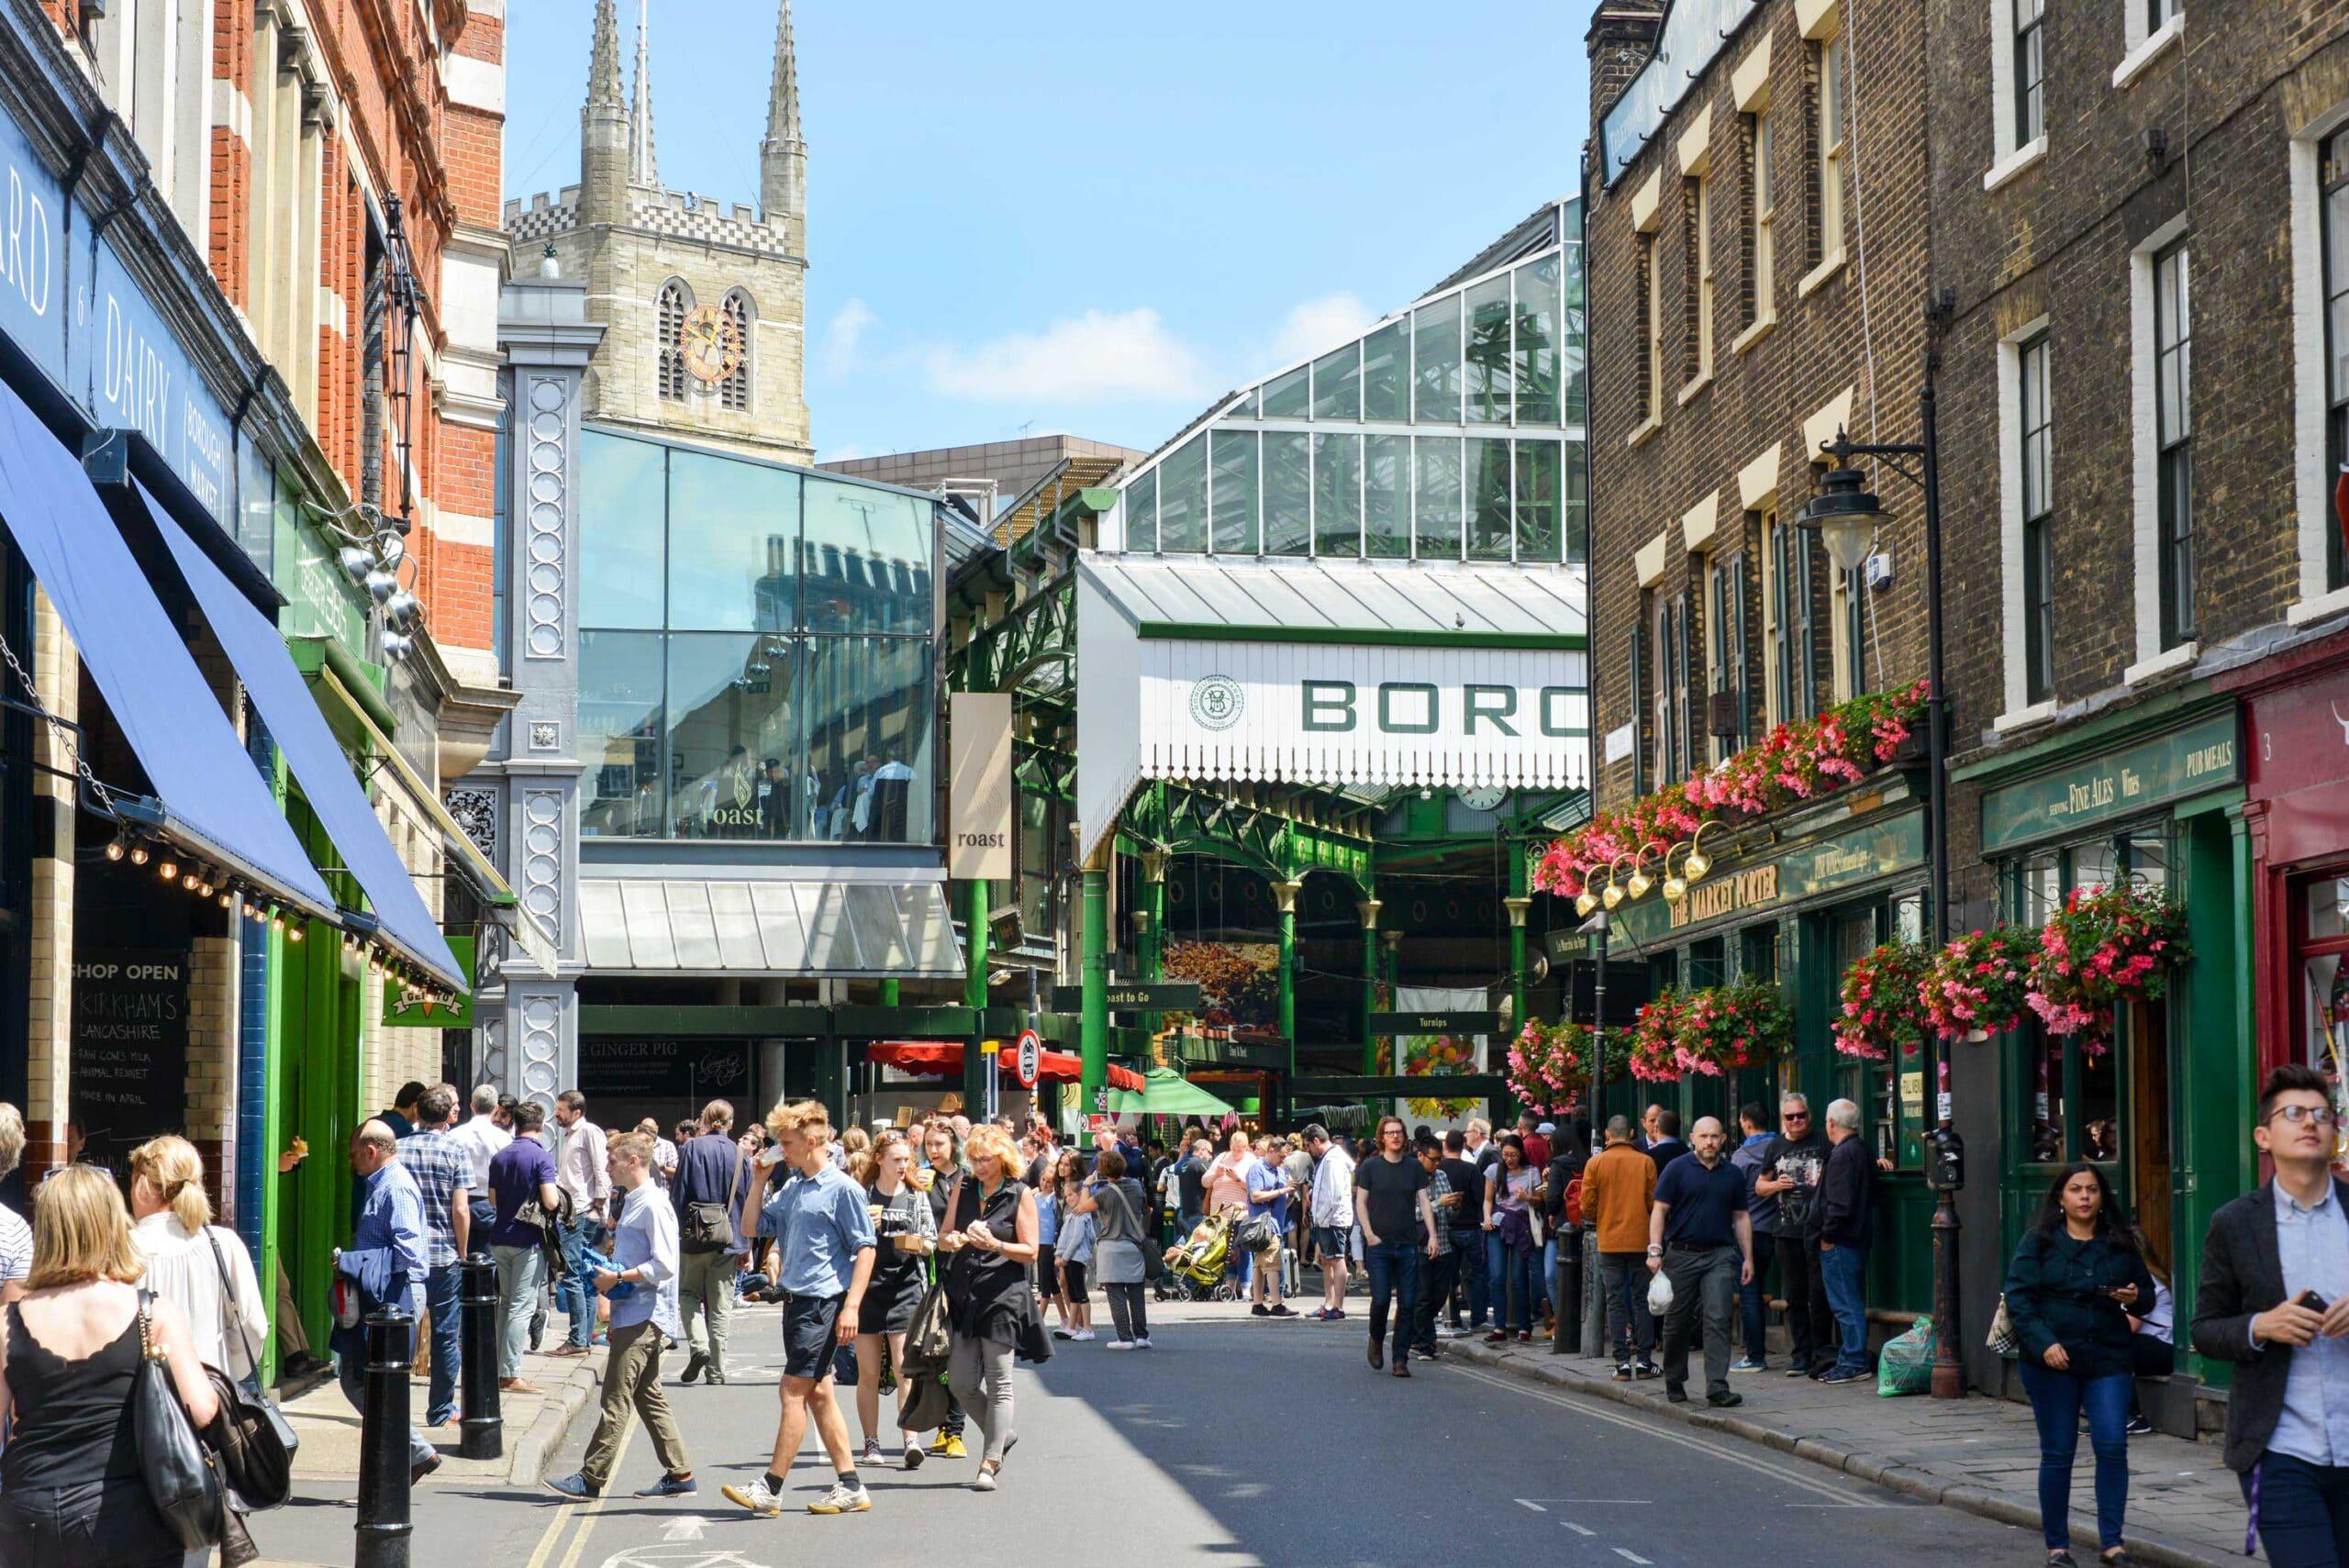 Borough Market - Borough High Street